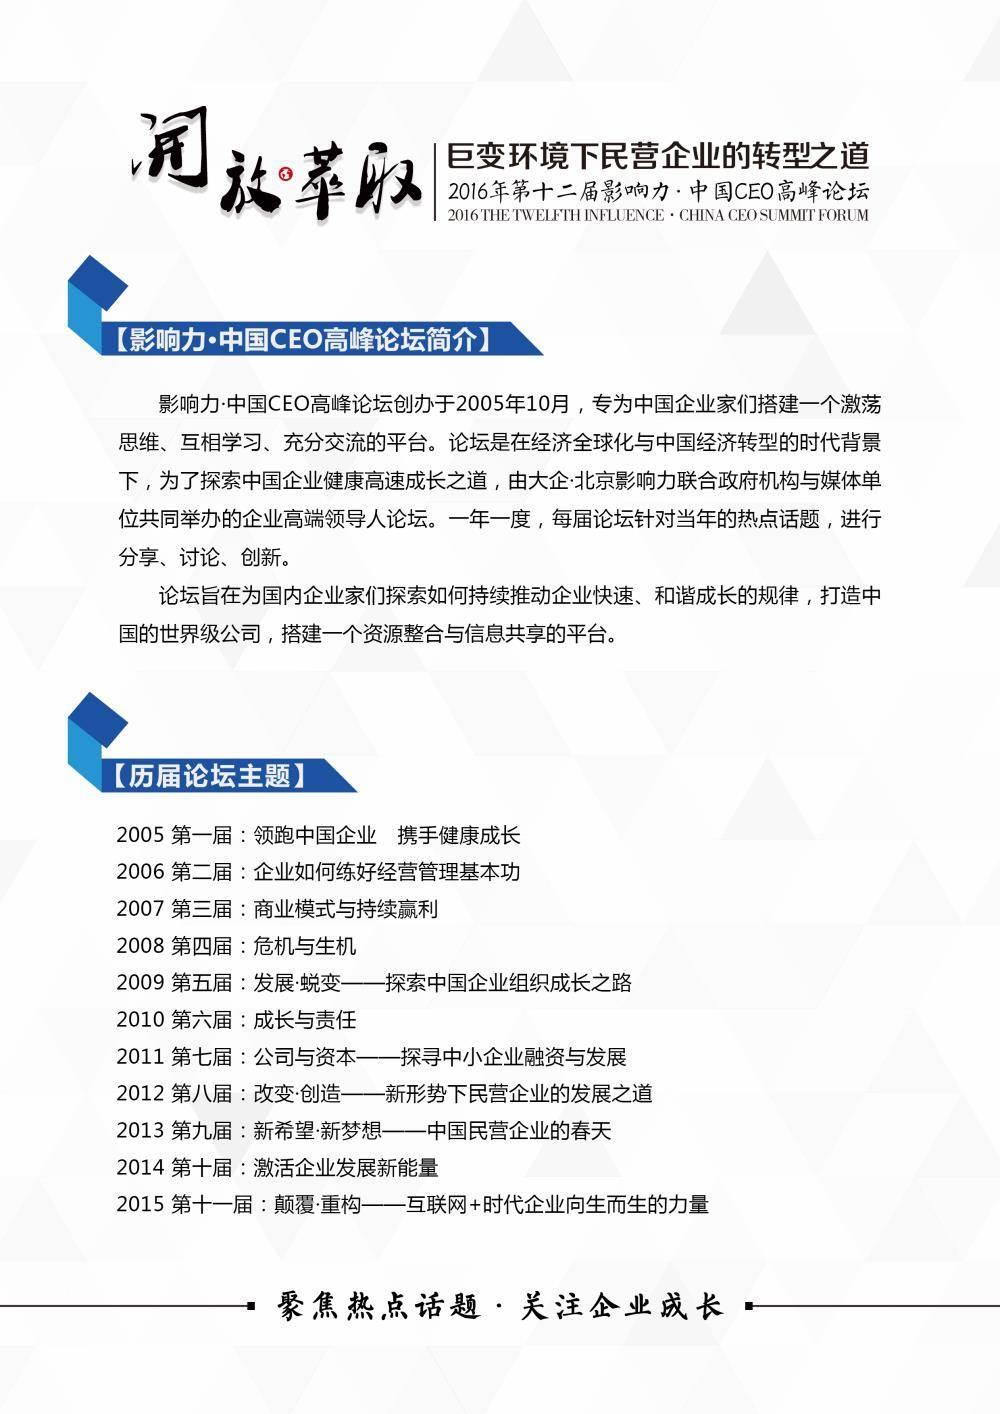 CEO嘉宾邀请函 印刷版 内页 2.jpg